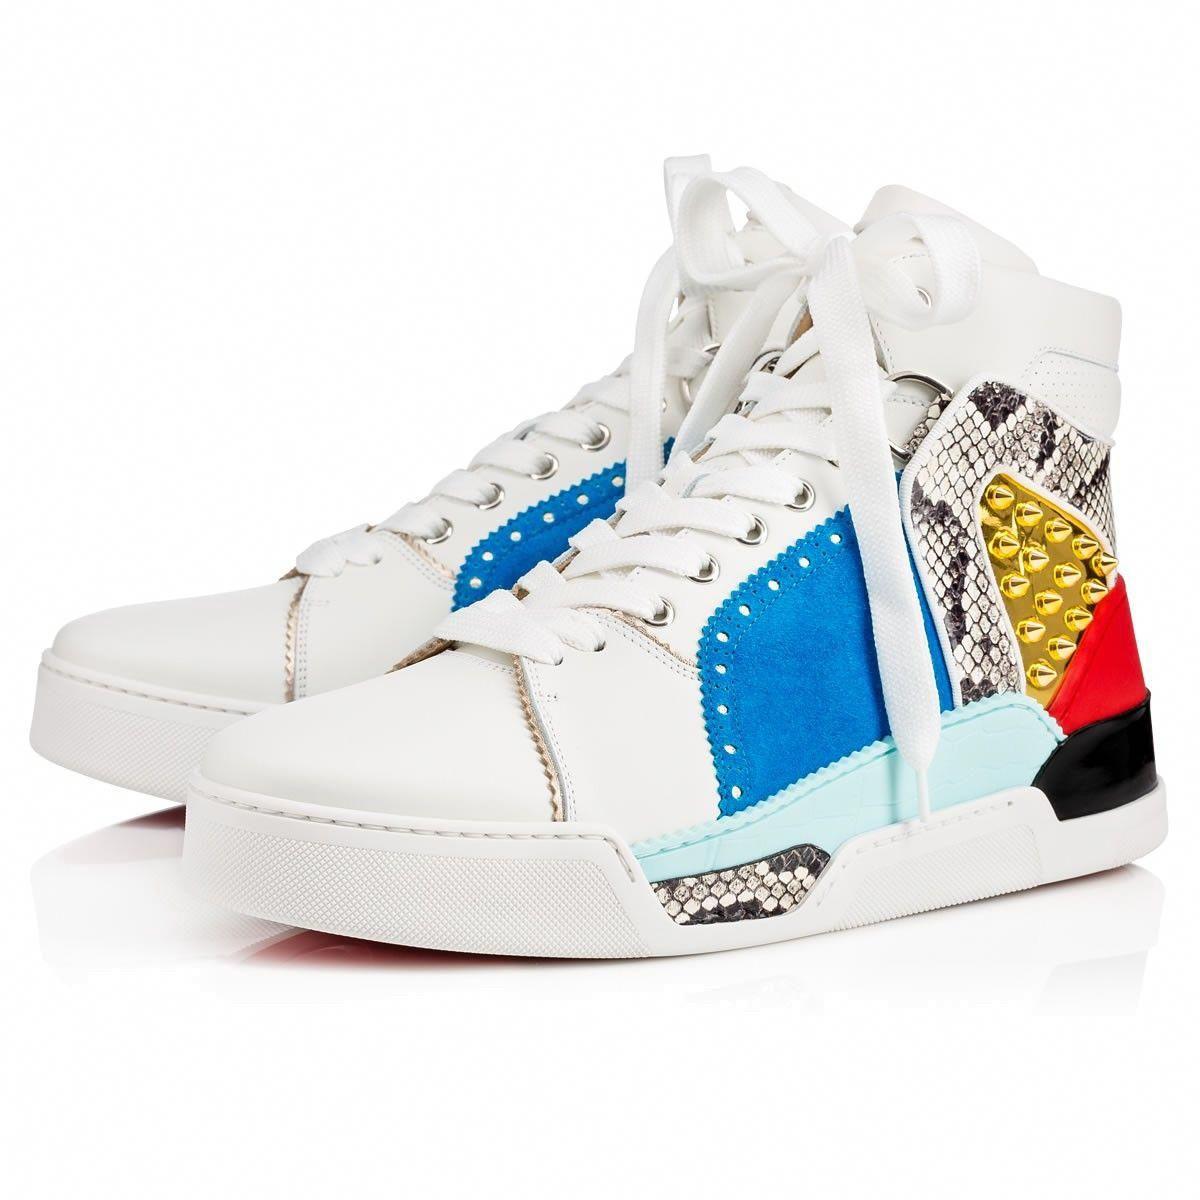 ba677667033 CHRISTIAN LOUBOUTIN Loubikick Flat Latte/Roccia Leather - Men Shoes ...